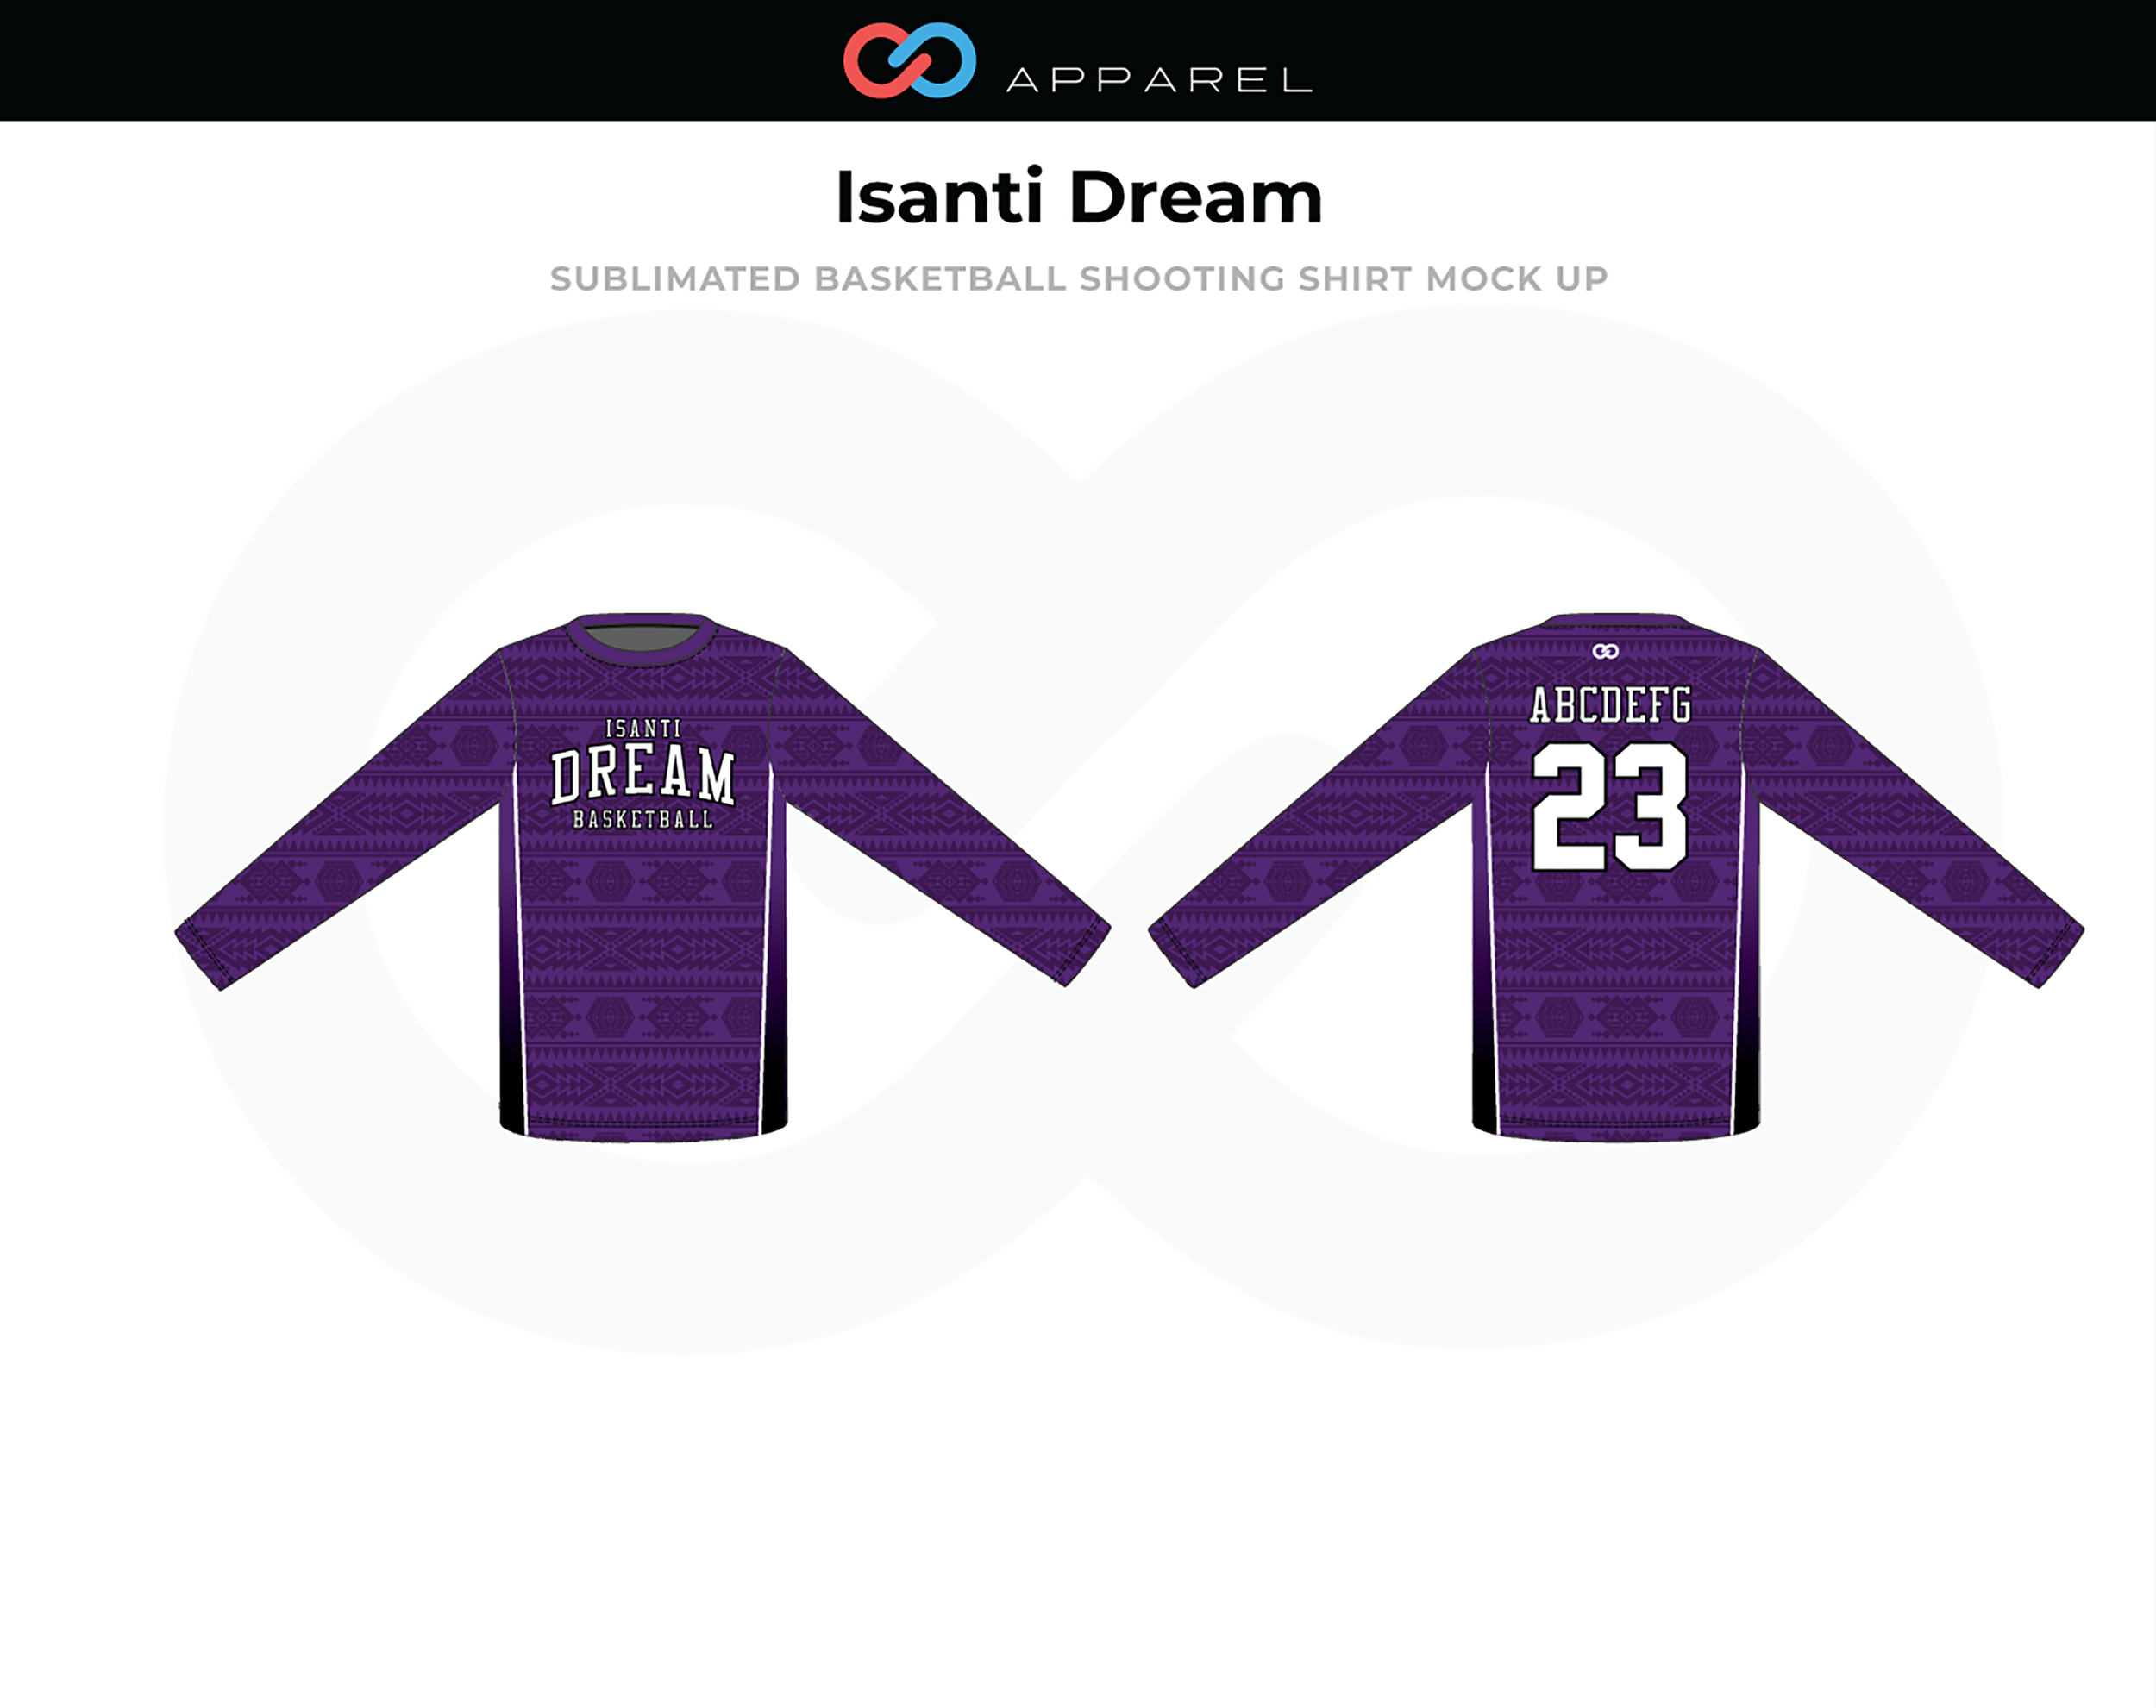 Isanti-Dream-Sublimated-Basketball-Shooting-Shirt-Mock-Up.png